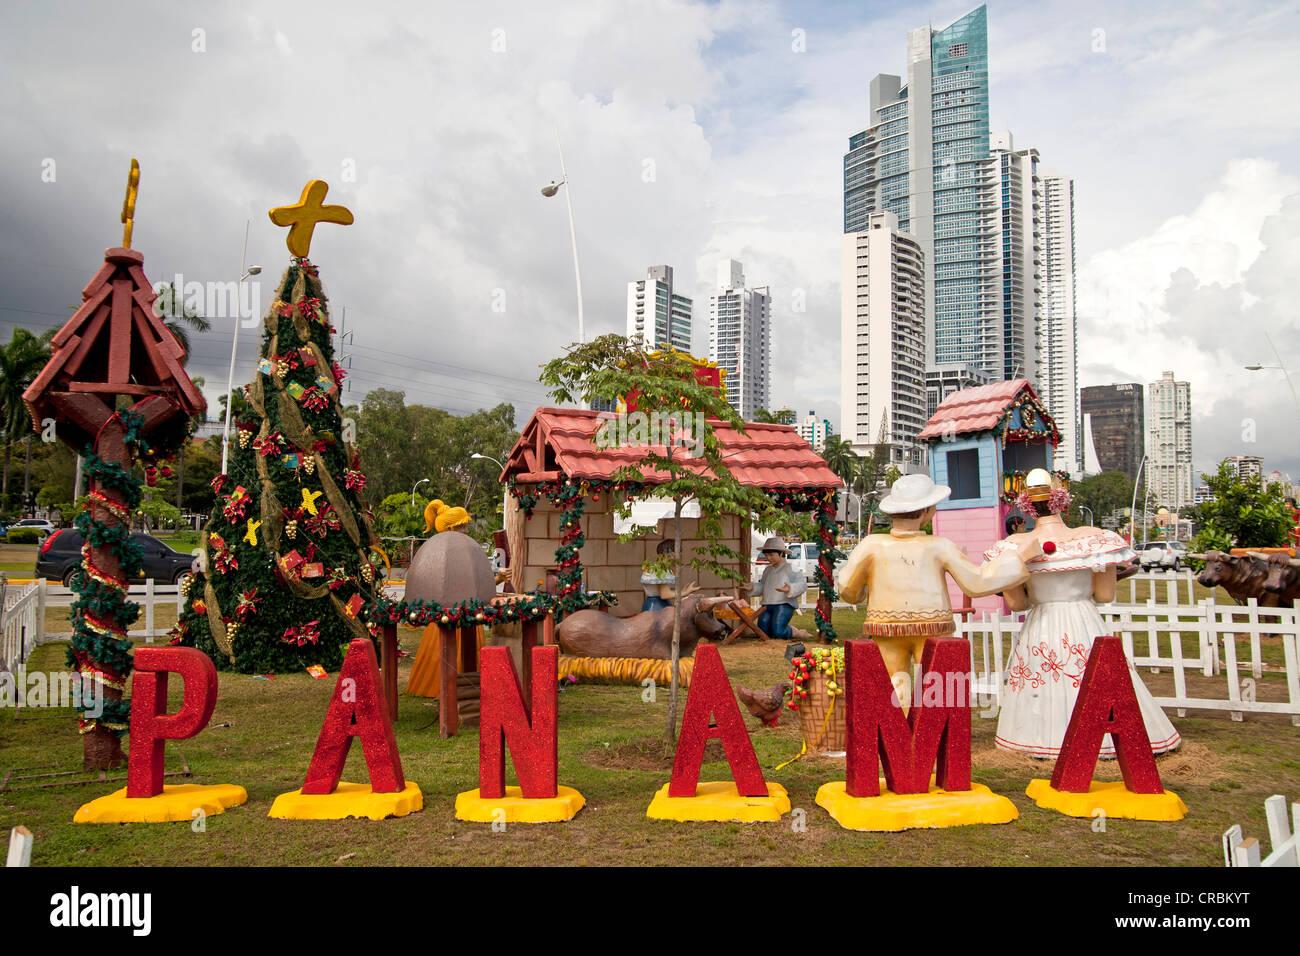 Christmas In Latin America.Decoration Christmas Latin America Stock Photos Decoration